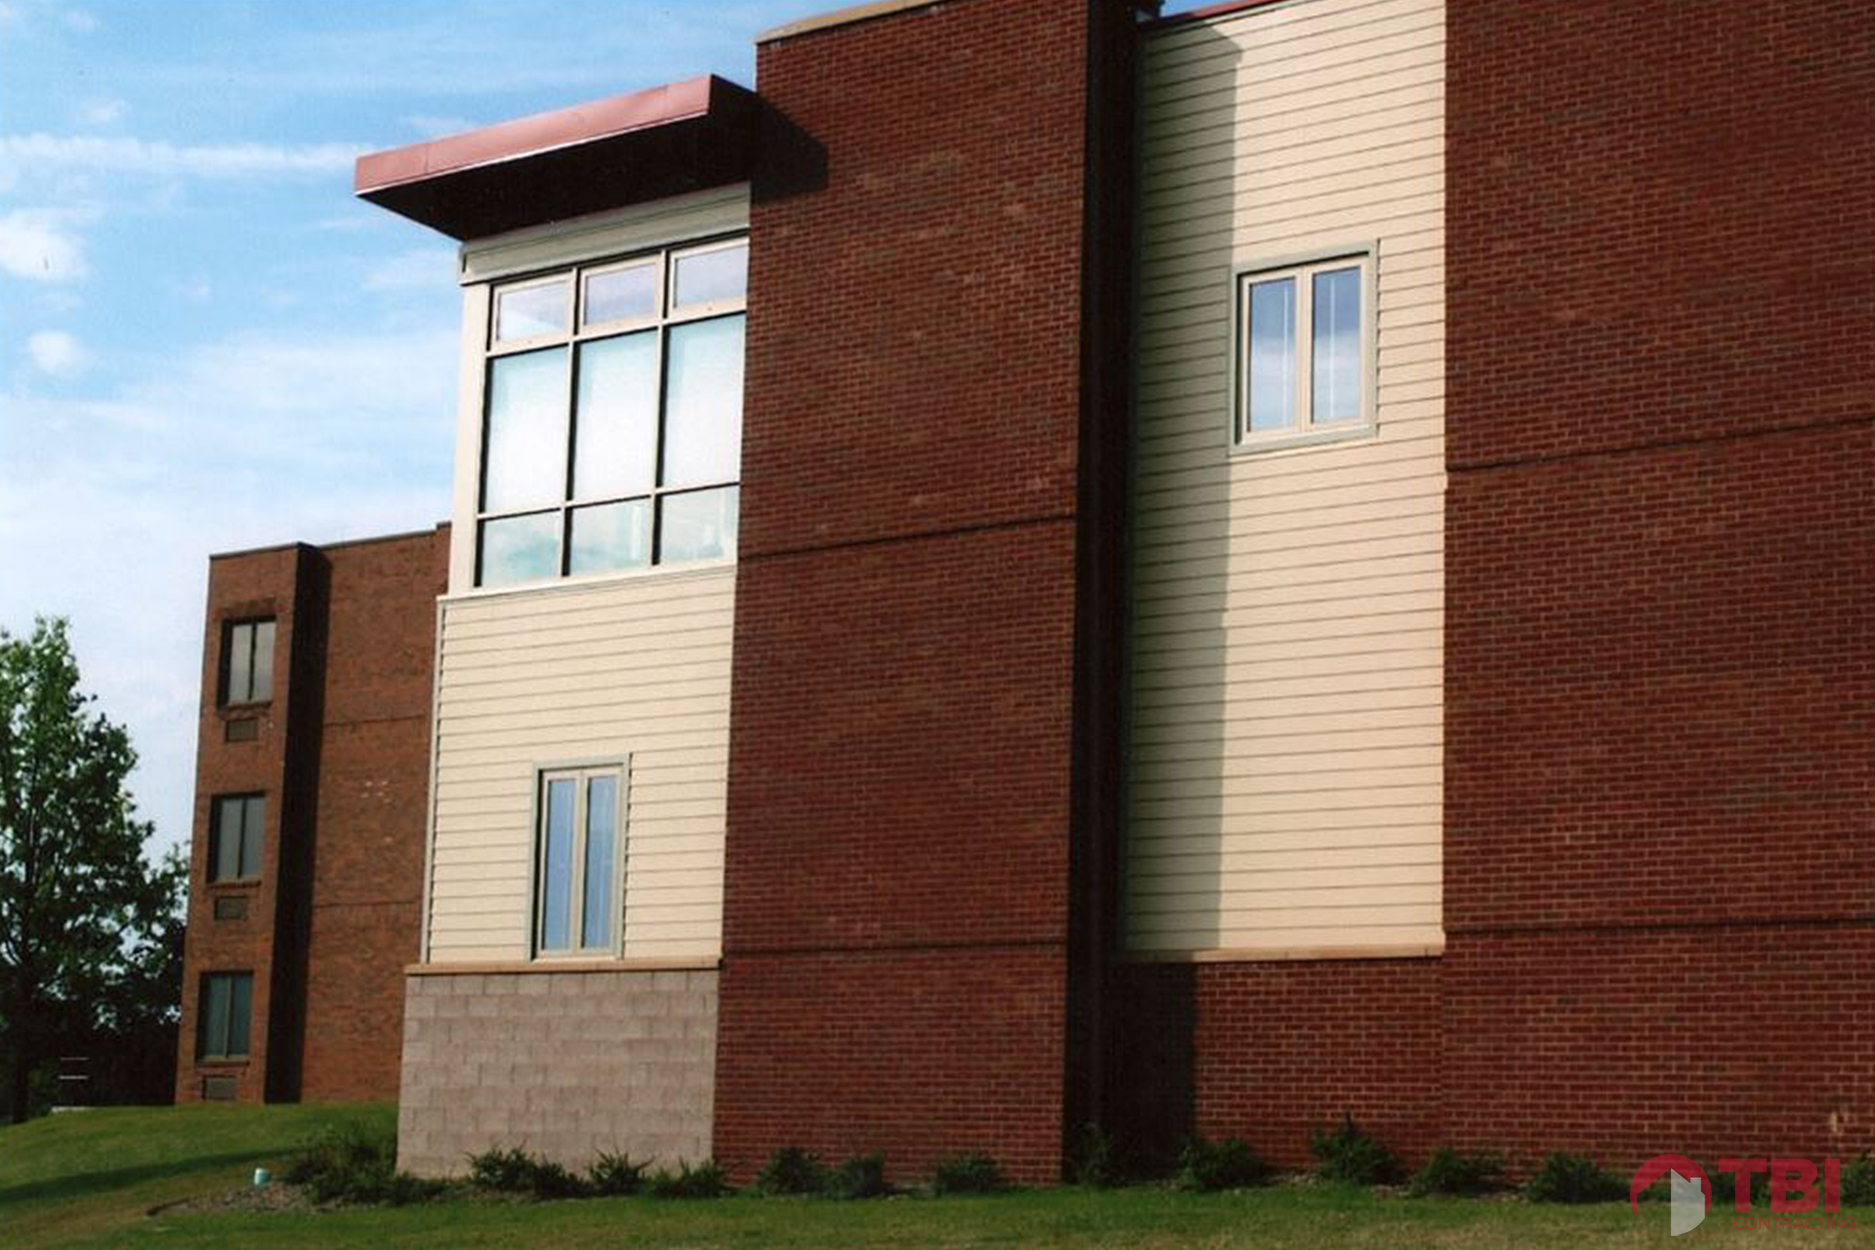 https://i2.wp.com/tbicontracting.com/wp-content/uploads/2015/05/washington-county-health-center-1.jpg?fit=1875%2C1250&ssl=1